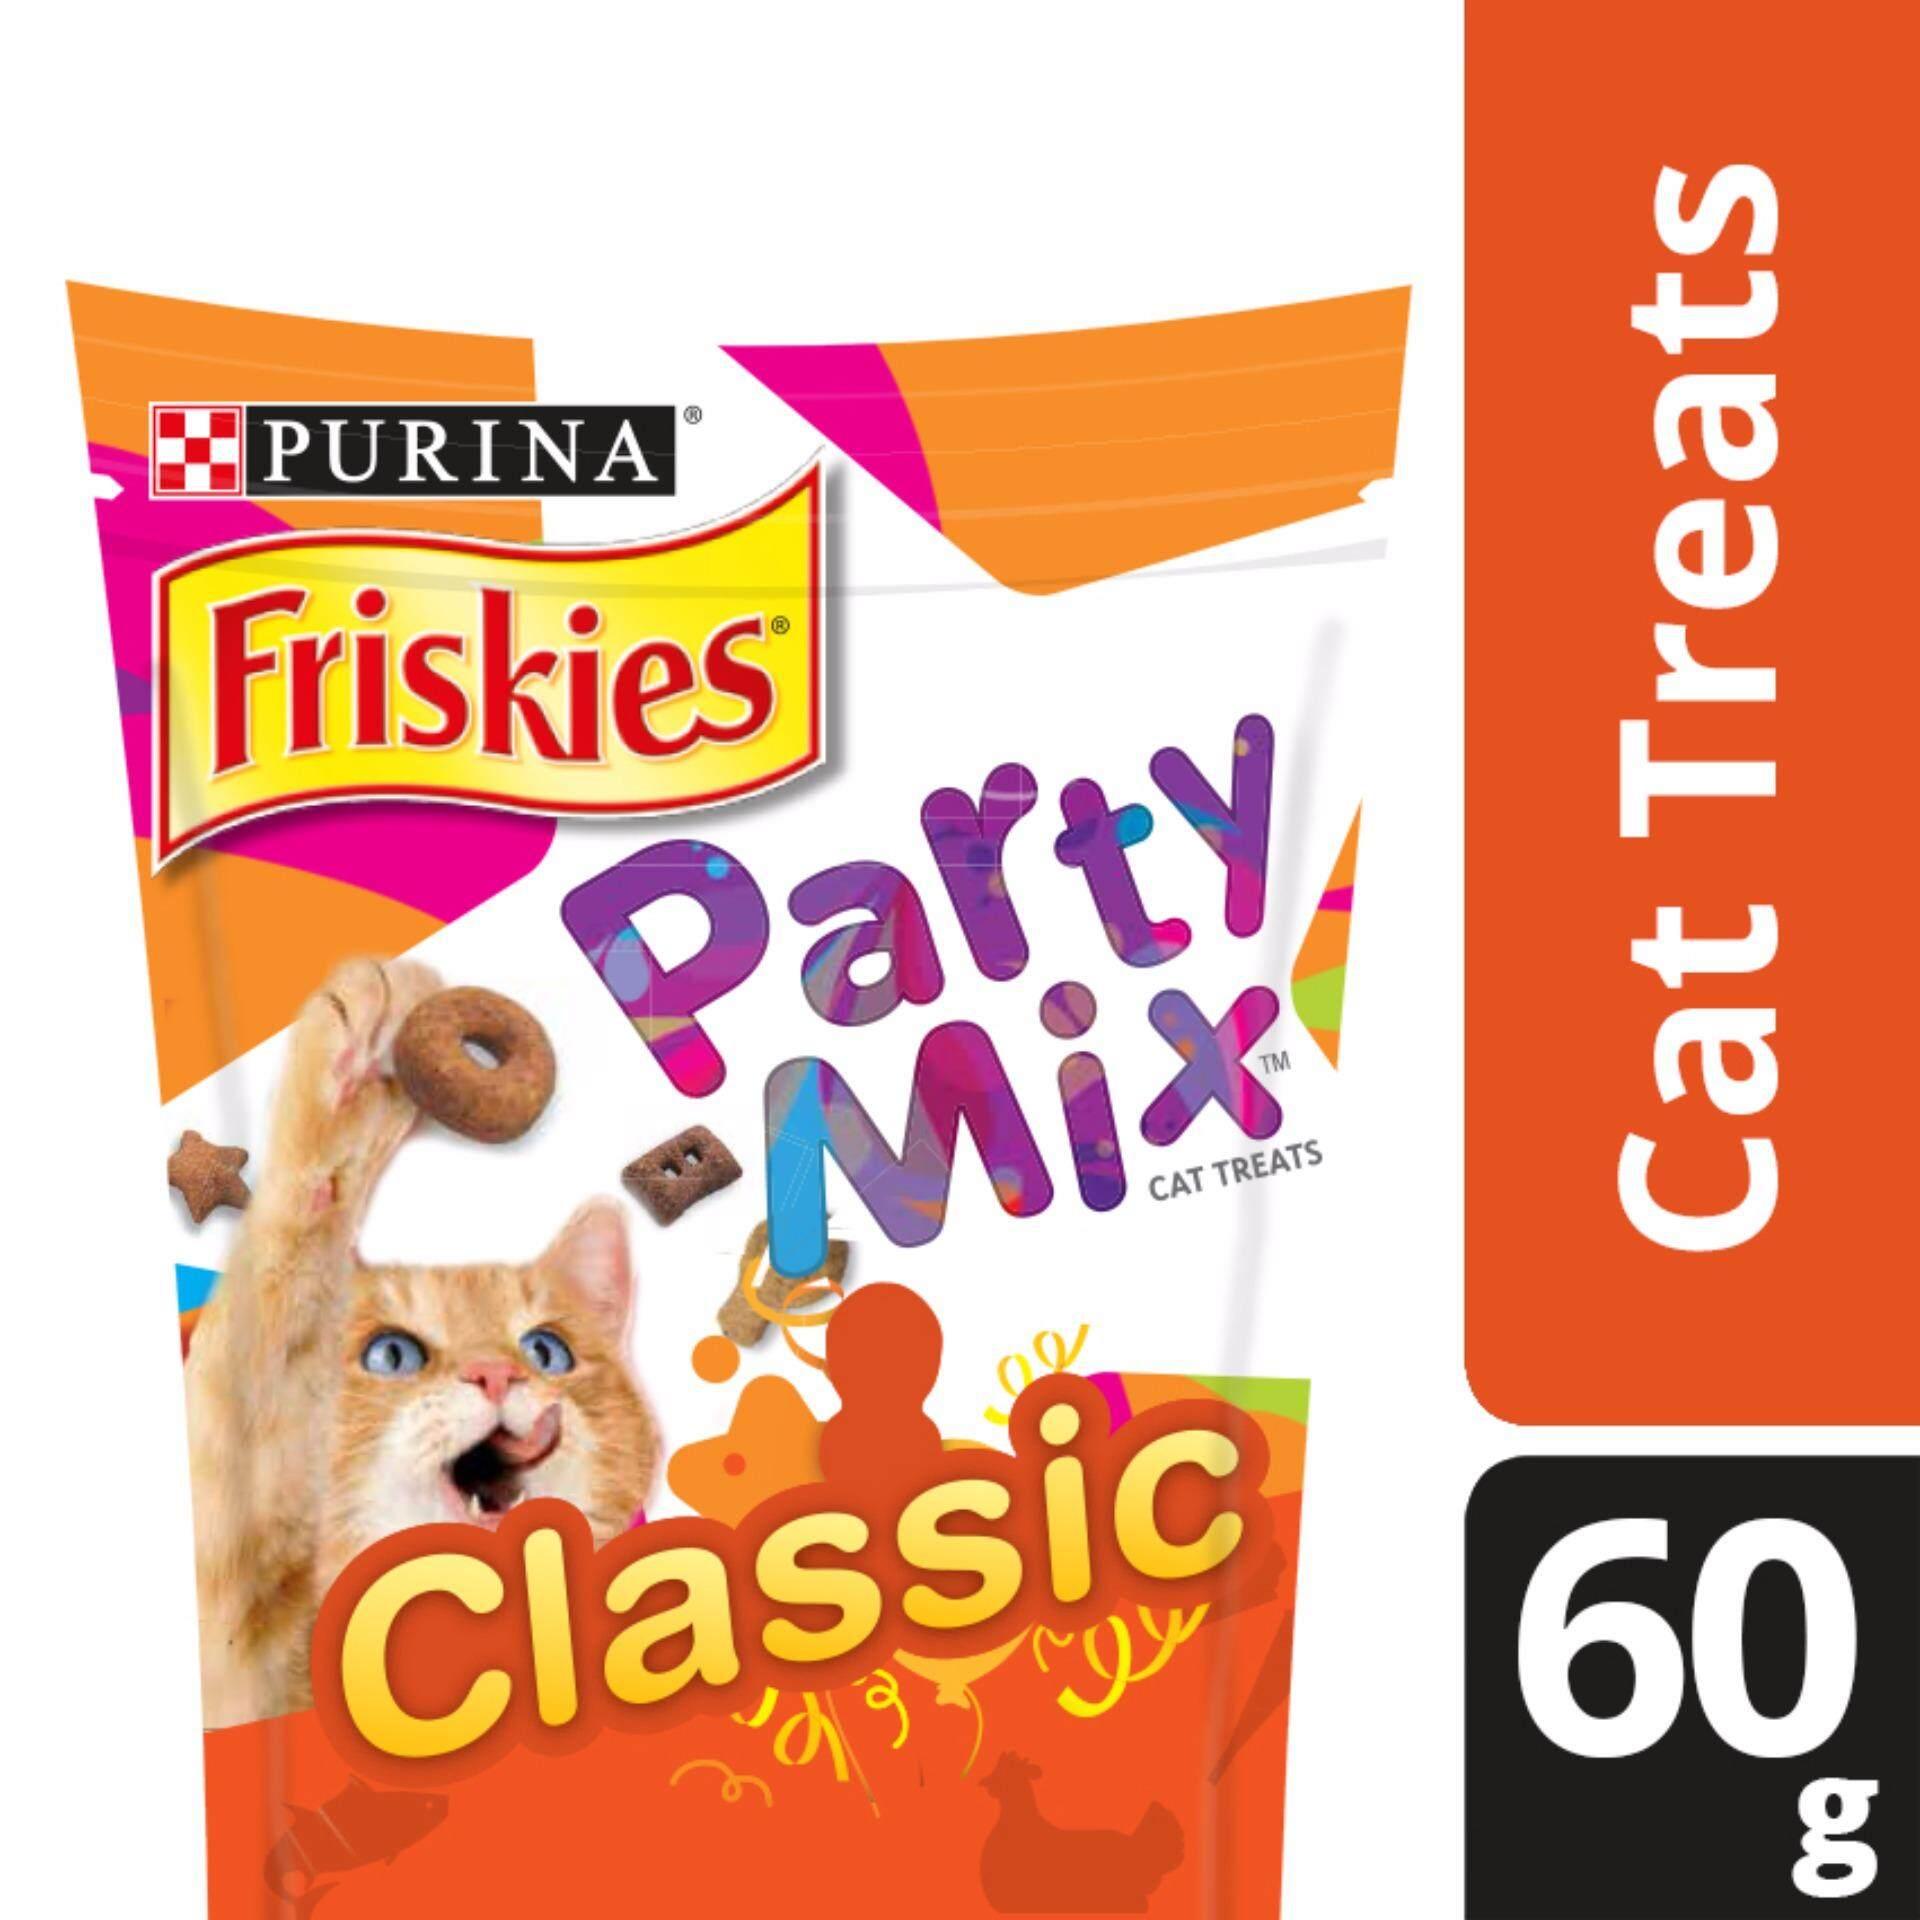 Friskies Party Mix Original Flavours Dry Cat Treats (1 x 60g)